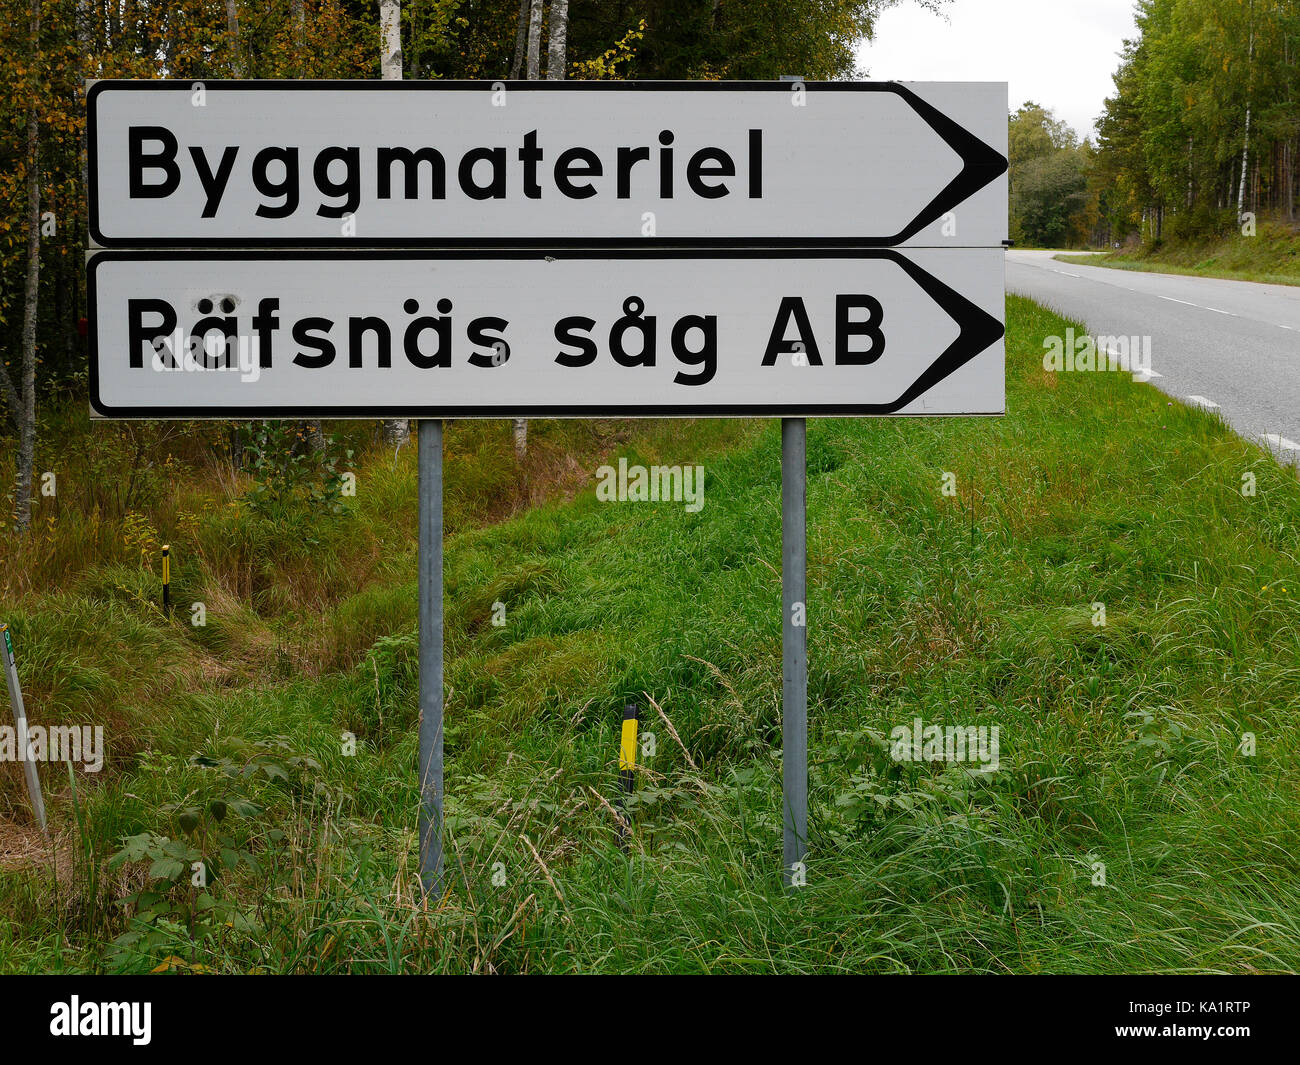 Segnaletica stradale fuori Räfsnäs såg, vicino a Gräddö, Rådmansö, nell'arcipelago Roslagen di Stoccolma, Svezia, Europa. Foto Stock